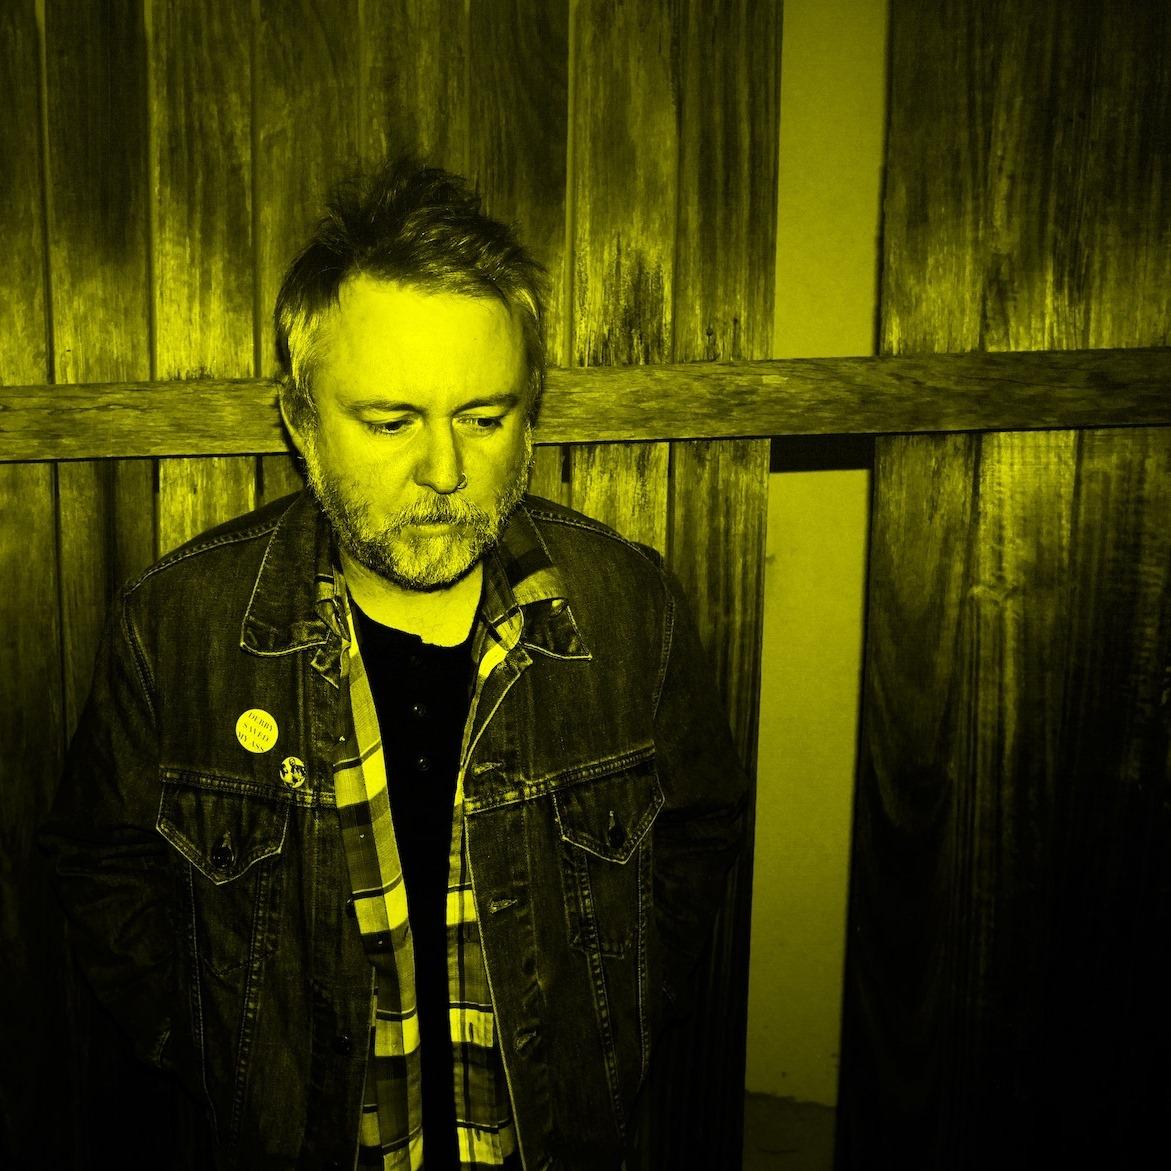 Album Review: Sydney's Darren Cross (Gerling) creates a little 'DISTORDER': a splendid electronic fugue for our dystopian times